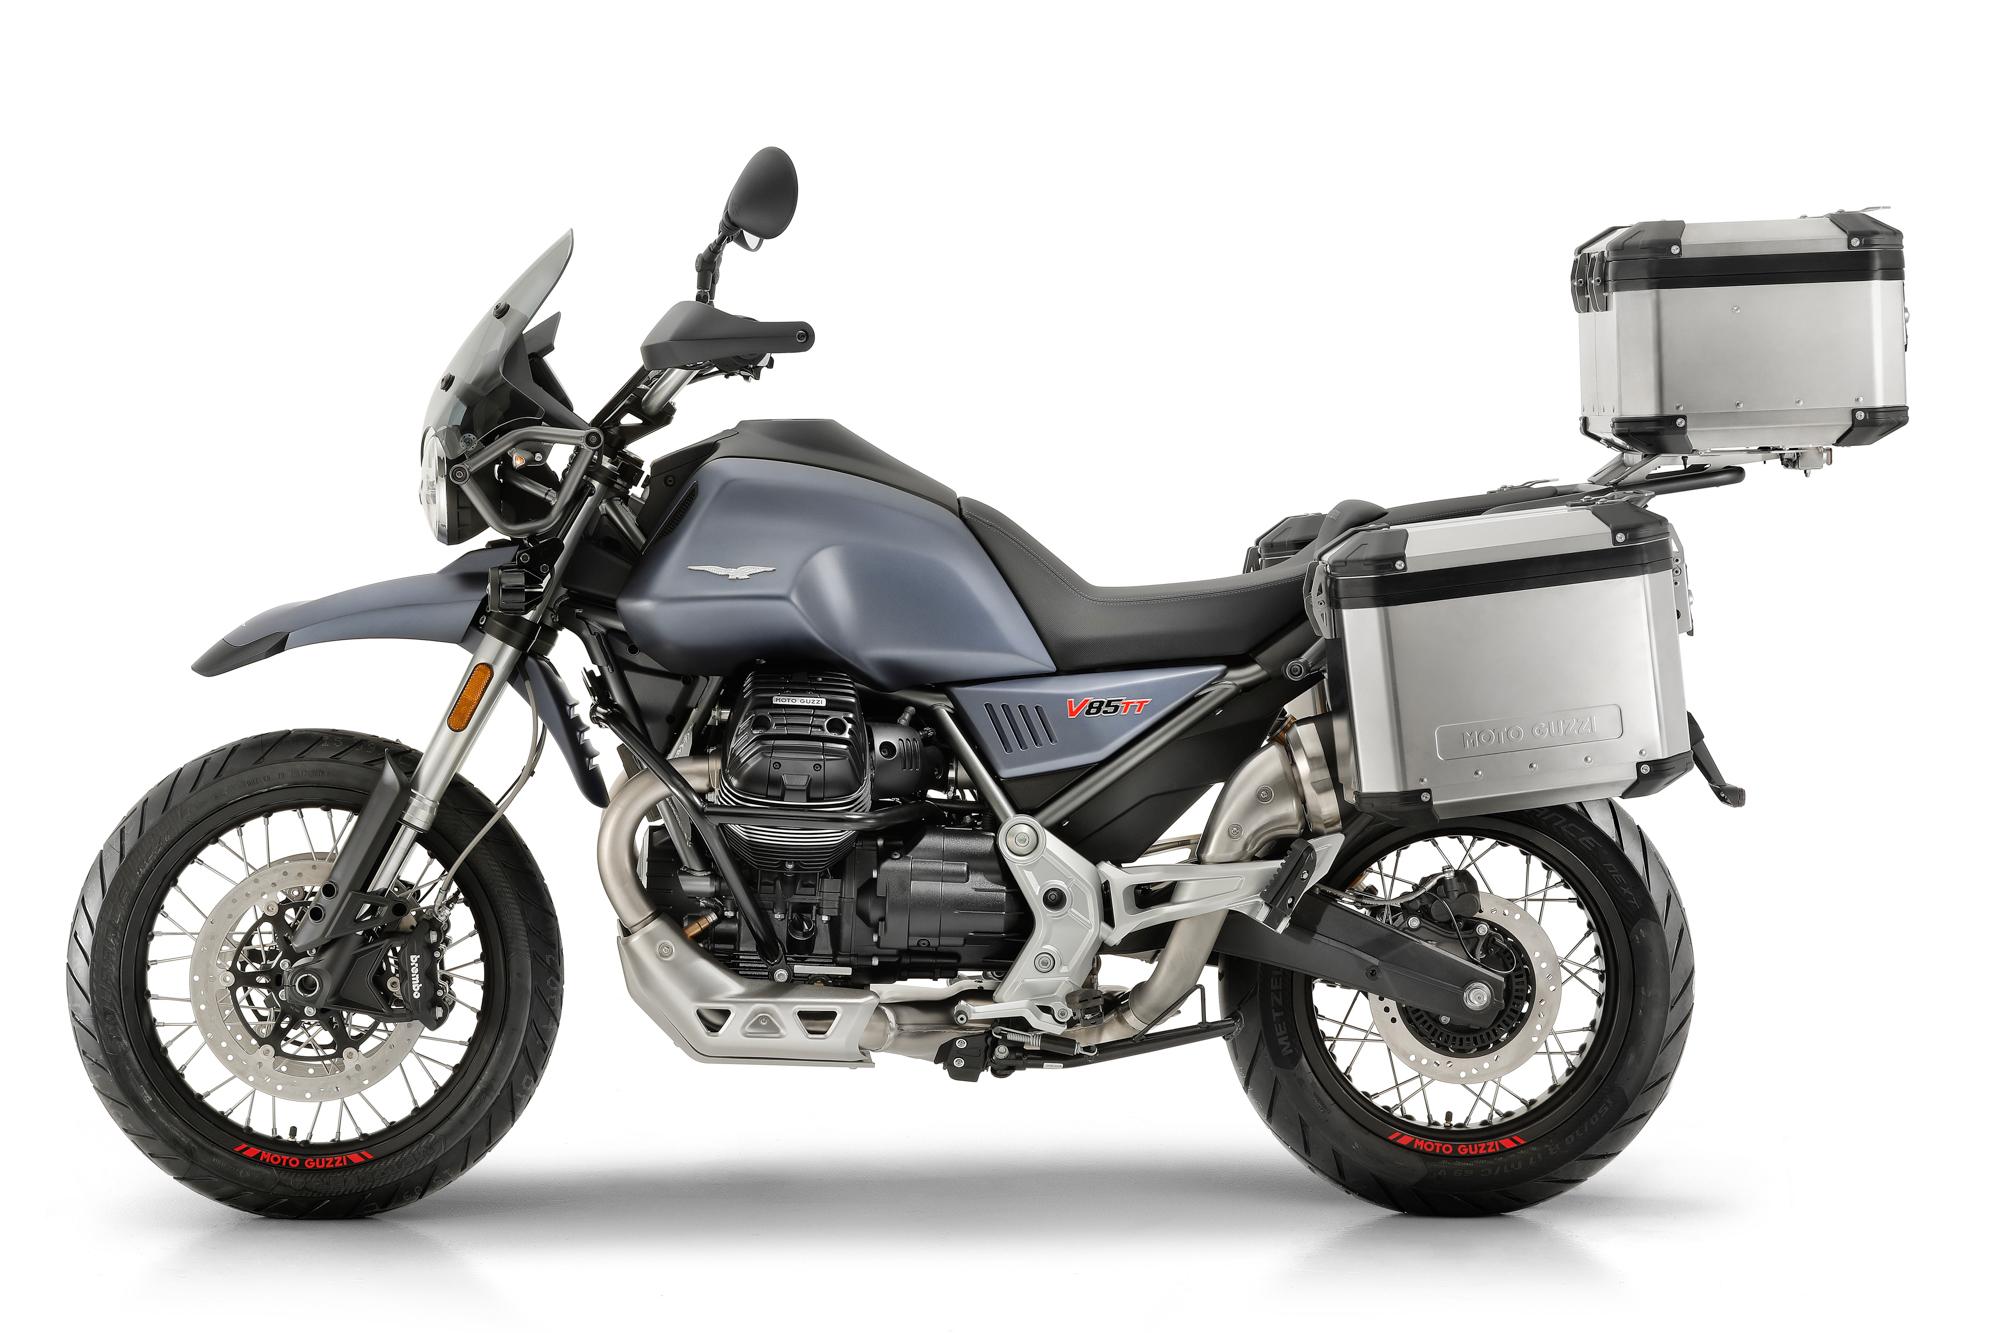 moto guzzi unveils v85 tt expedition portal. Black Bedroom Furniture Sets. Home Design Ideas